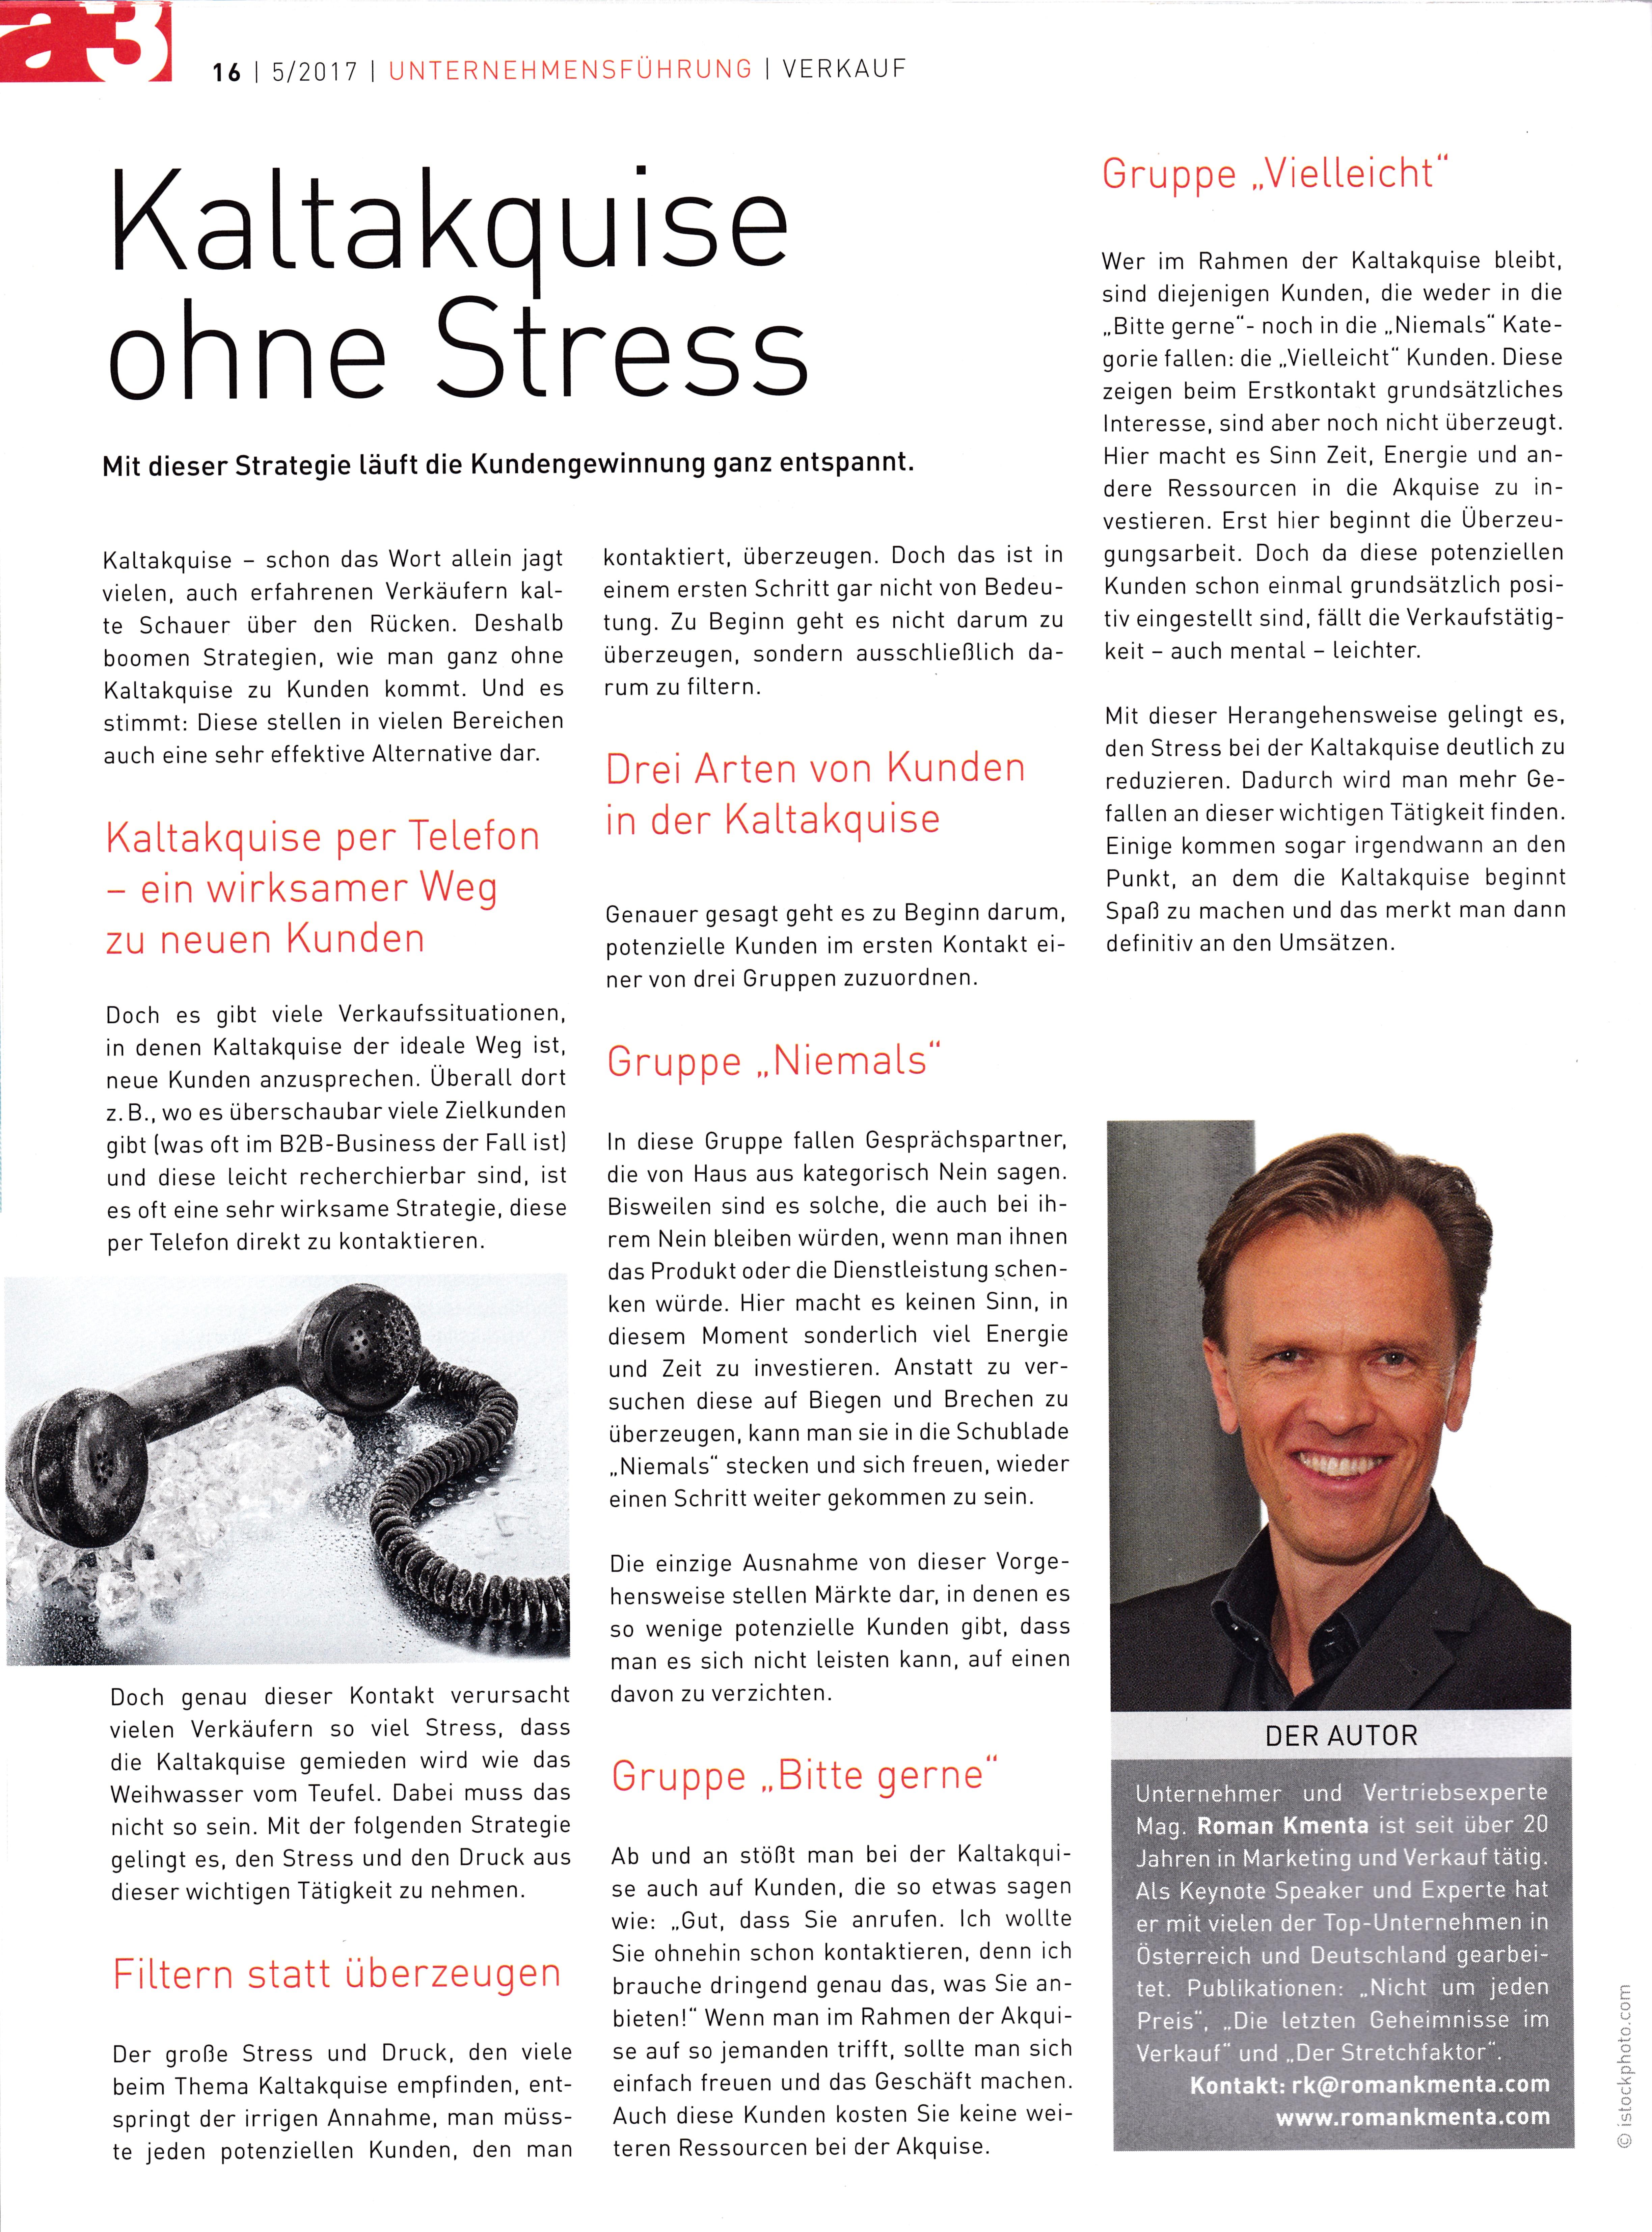 a3 ECO Unternehmermagazin 5-2017 - 1 - Kaltakquise- Roman Kmenta - Keynote Speaker und Autor